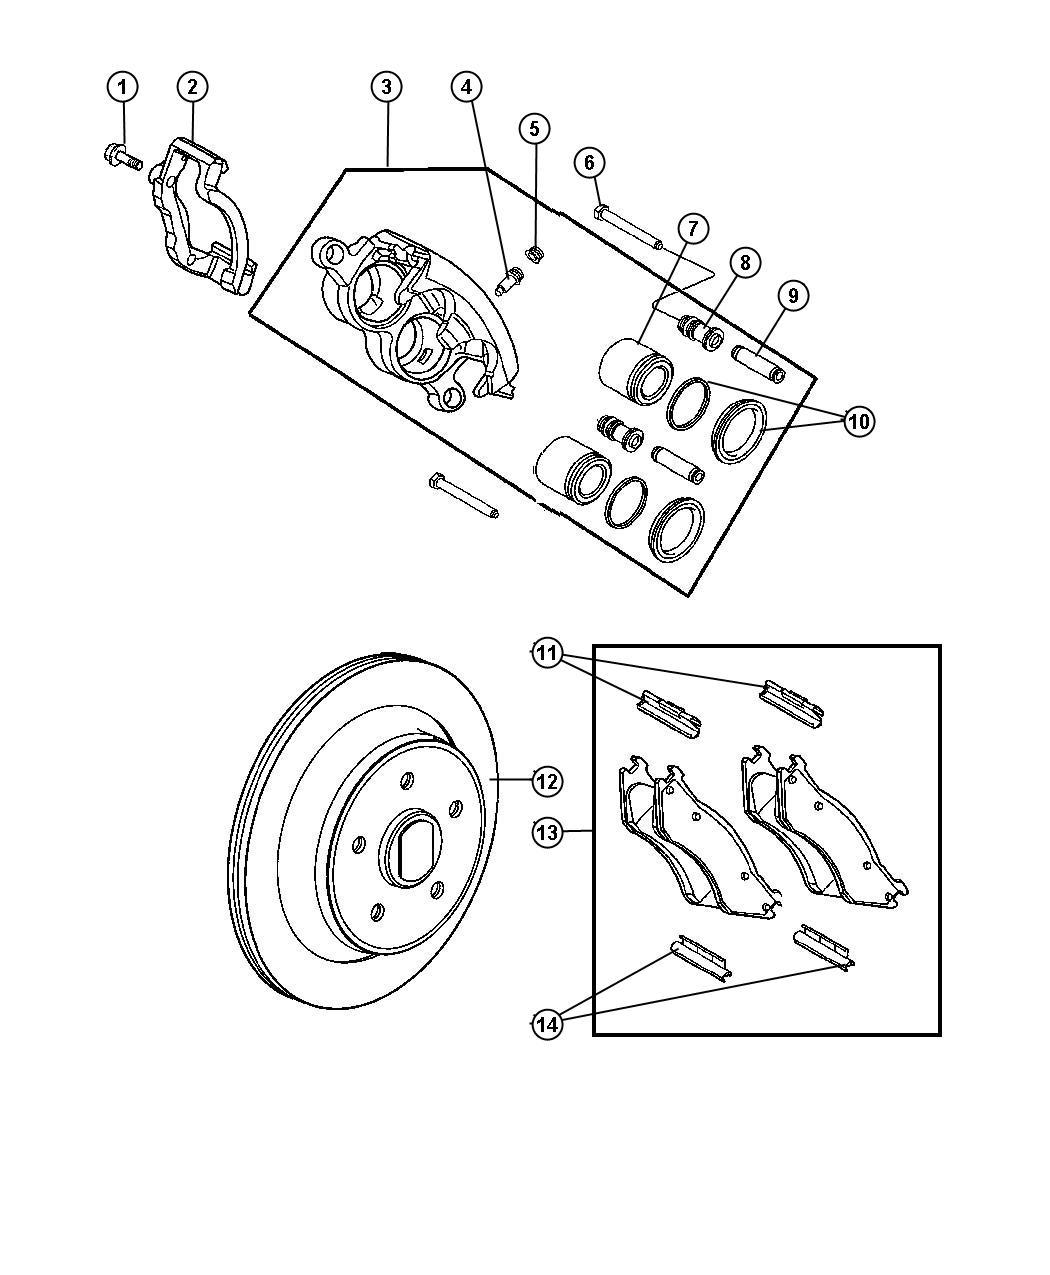 2011 Dodge Ram 5500 Rotor. Brake. Axle, rear, spin